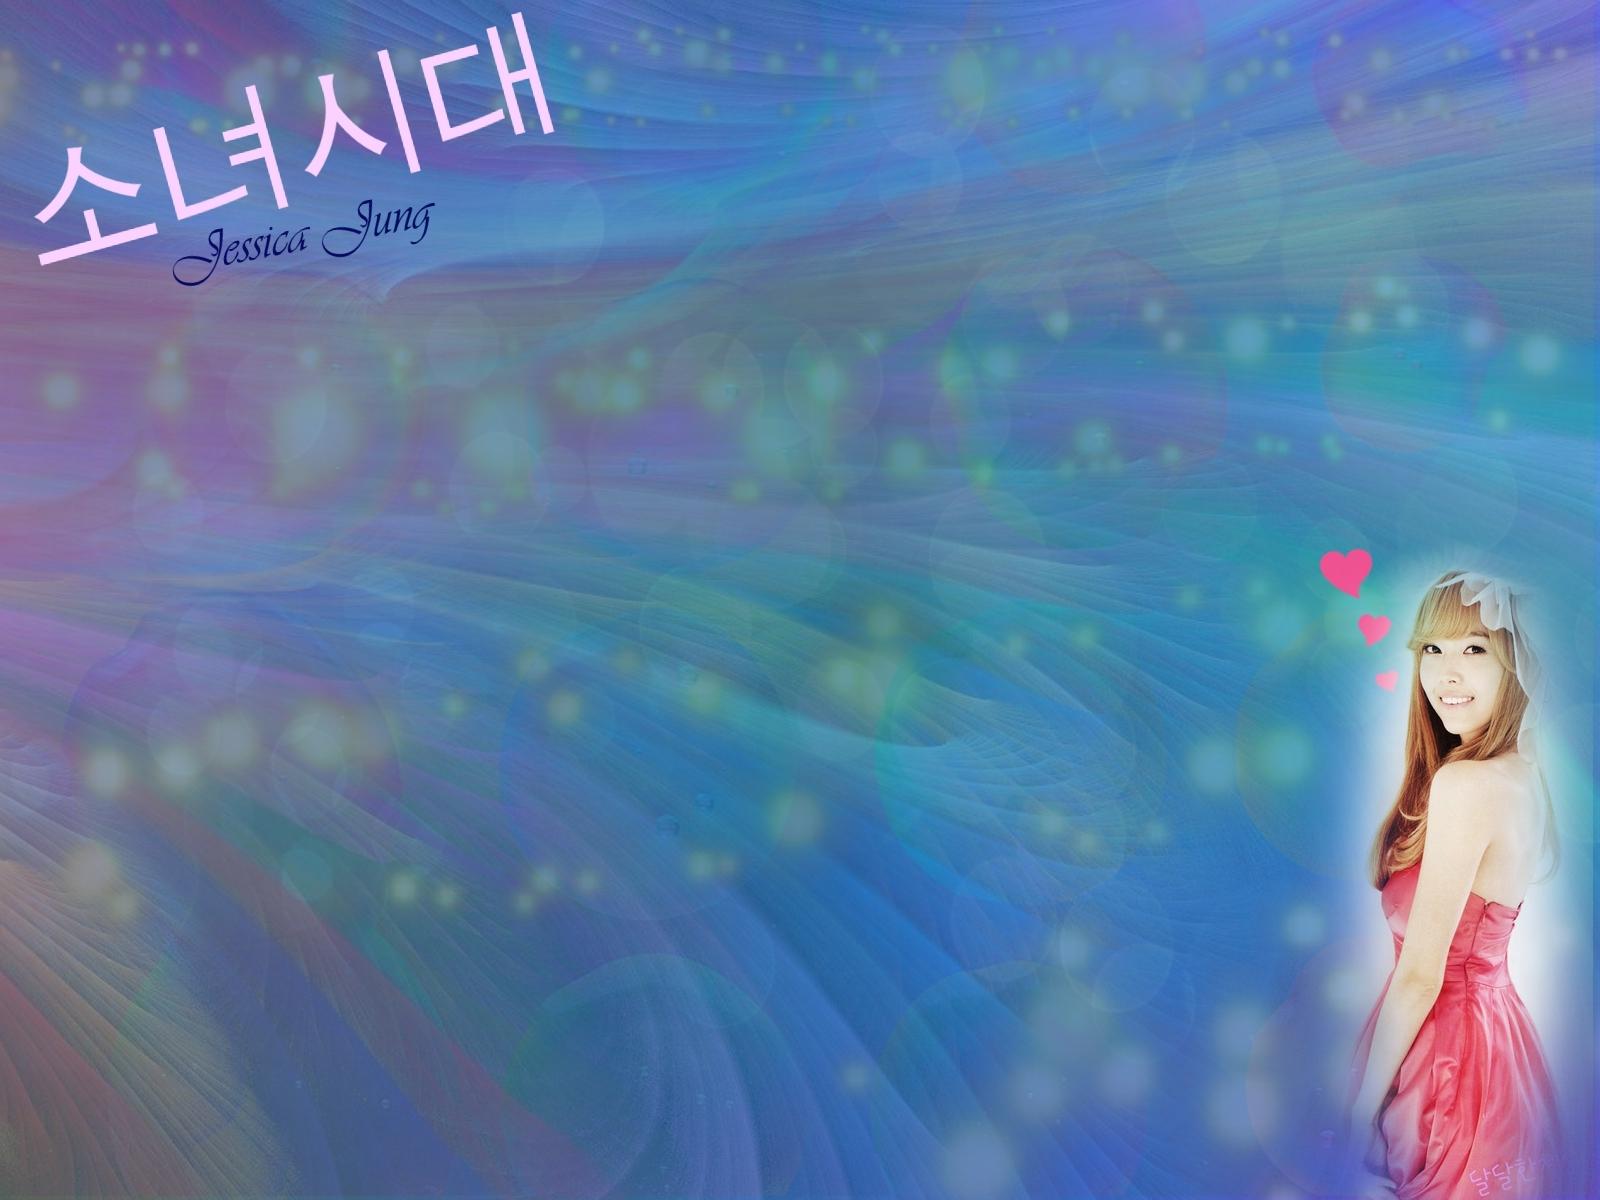 Snsd Wallpaper on Girls Generation Snsd Celebrity Hd Wallpaper   Girls   817757